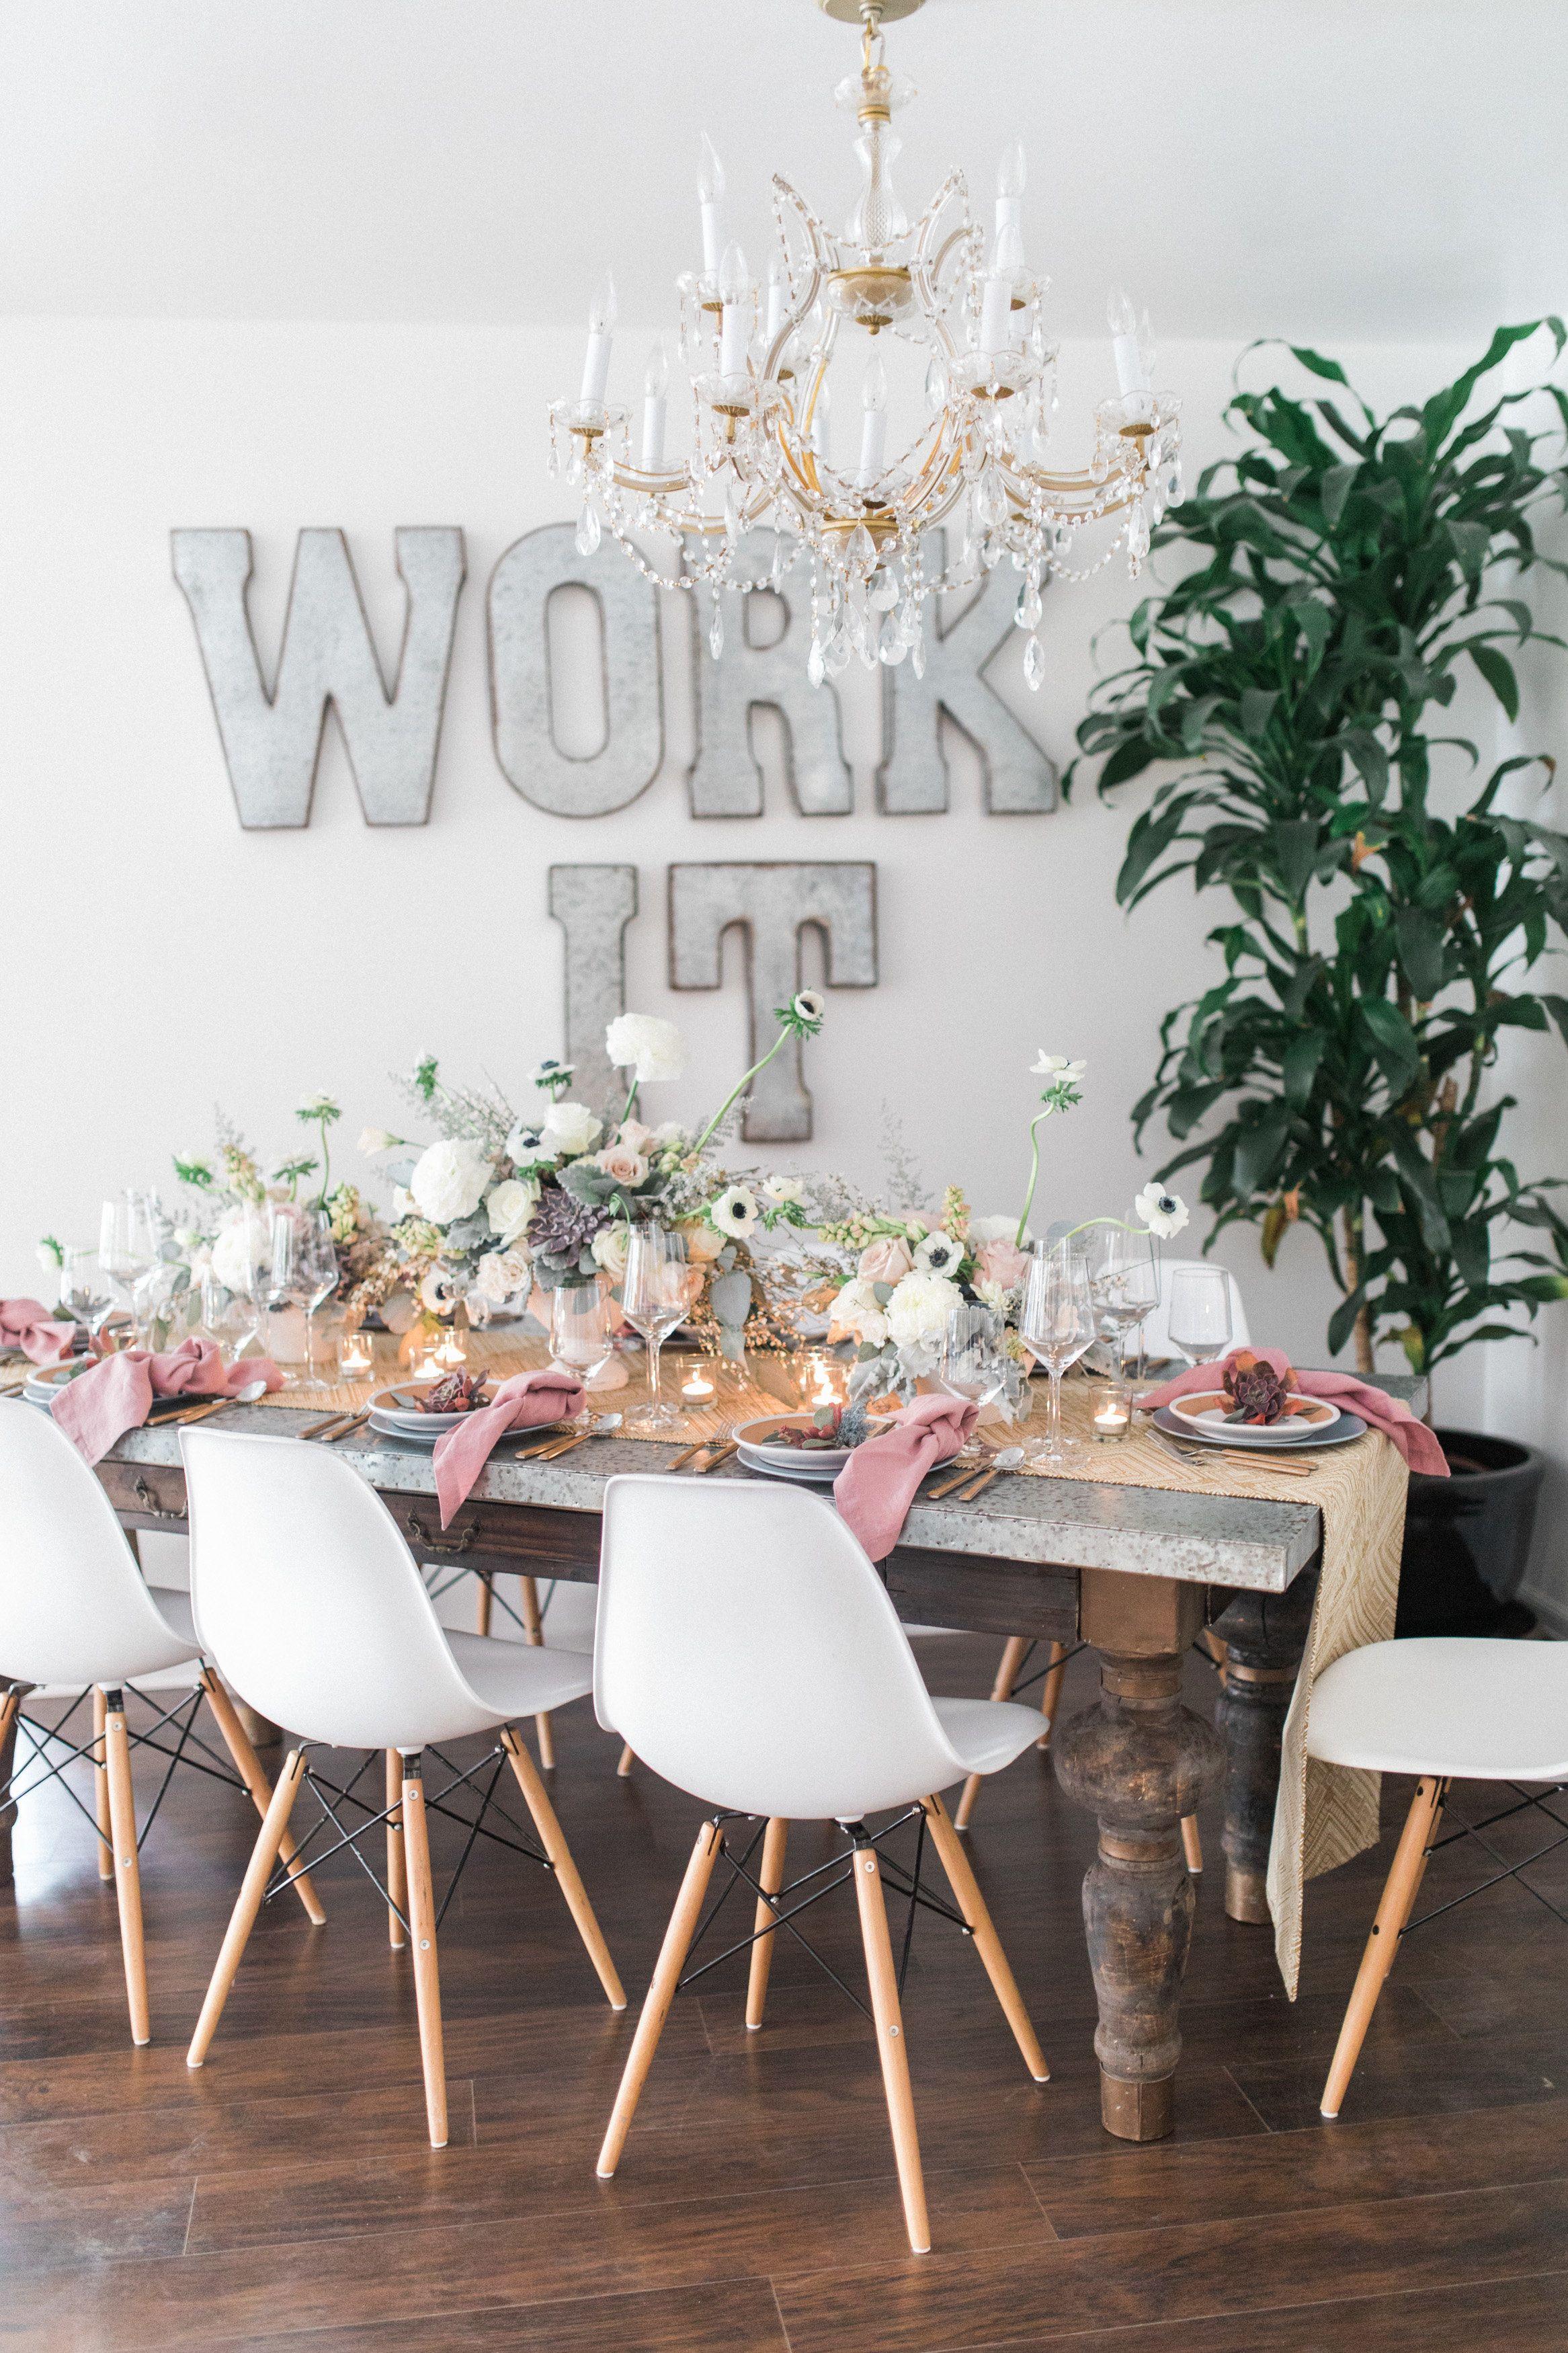 Party Pleasers Event Rental Co Pop Up Showroom zinc top wood